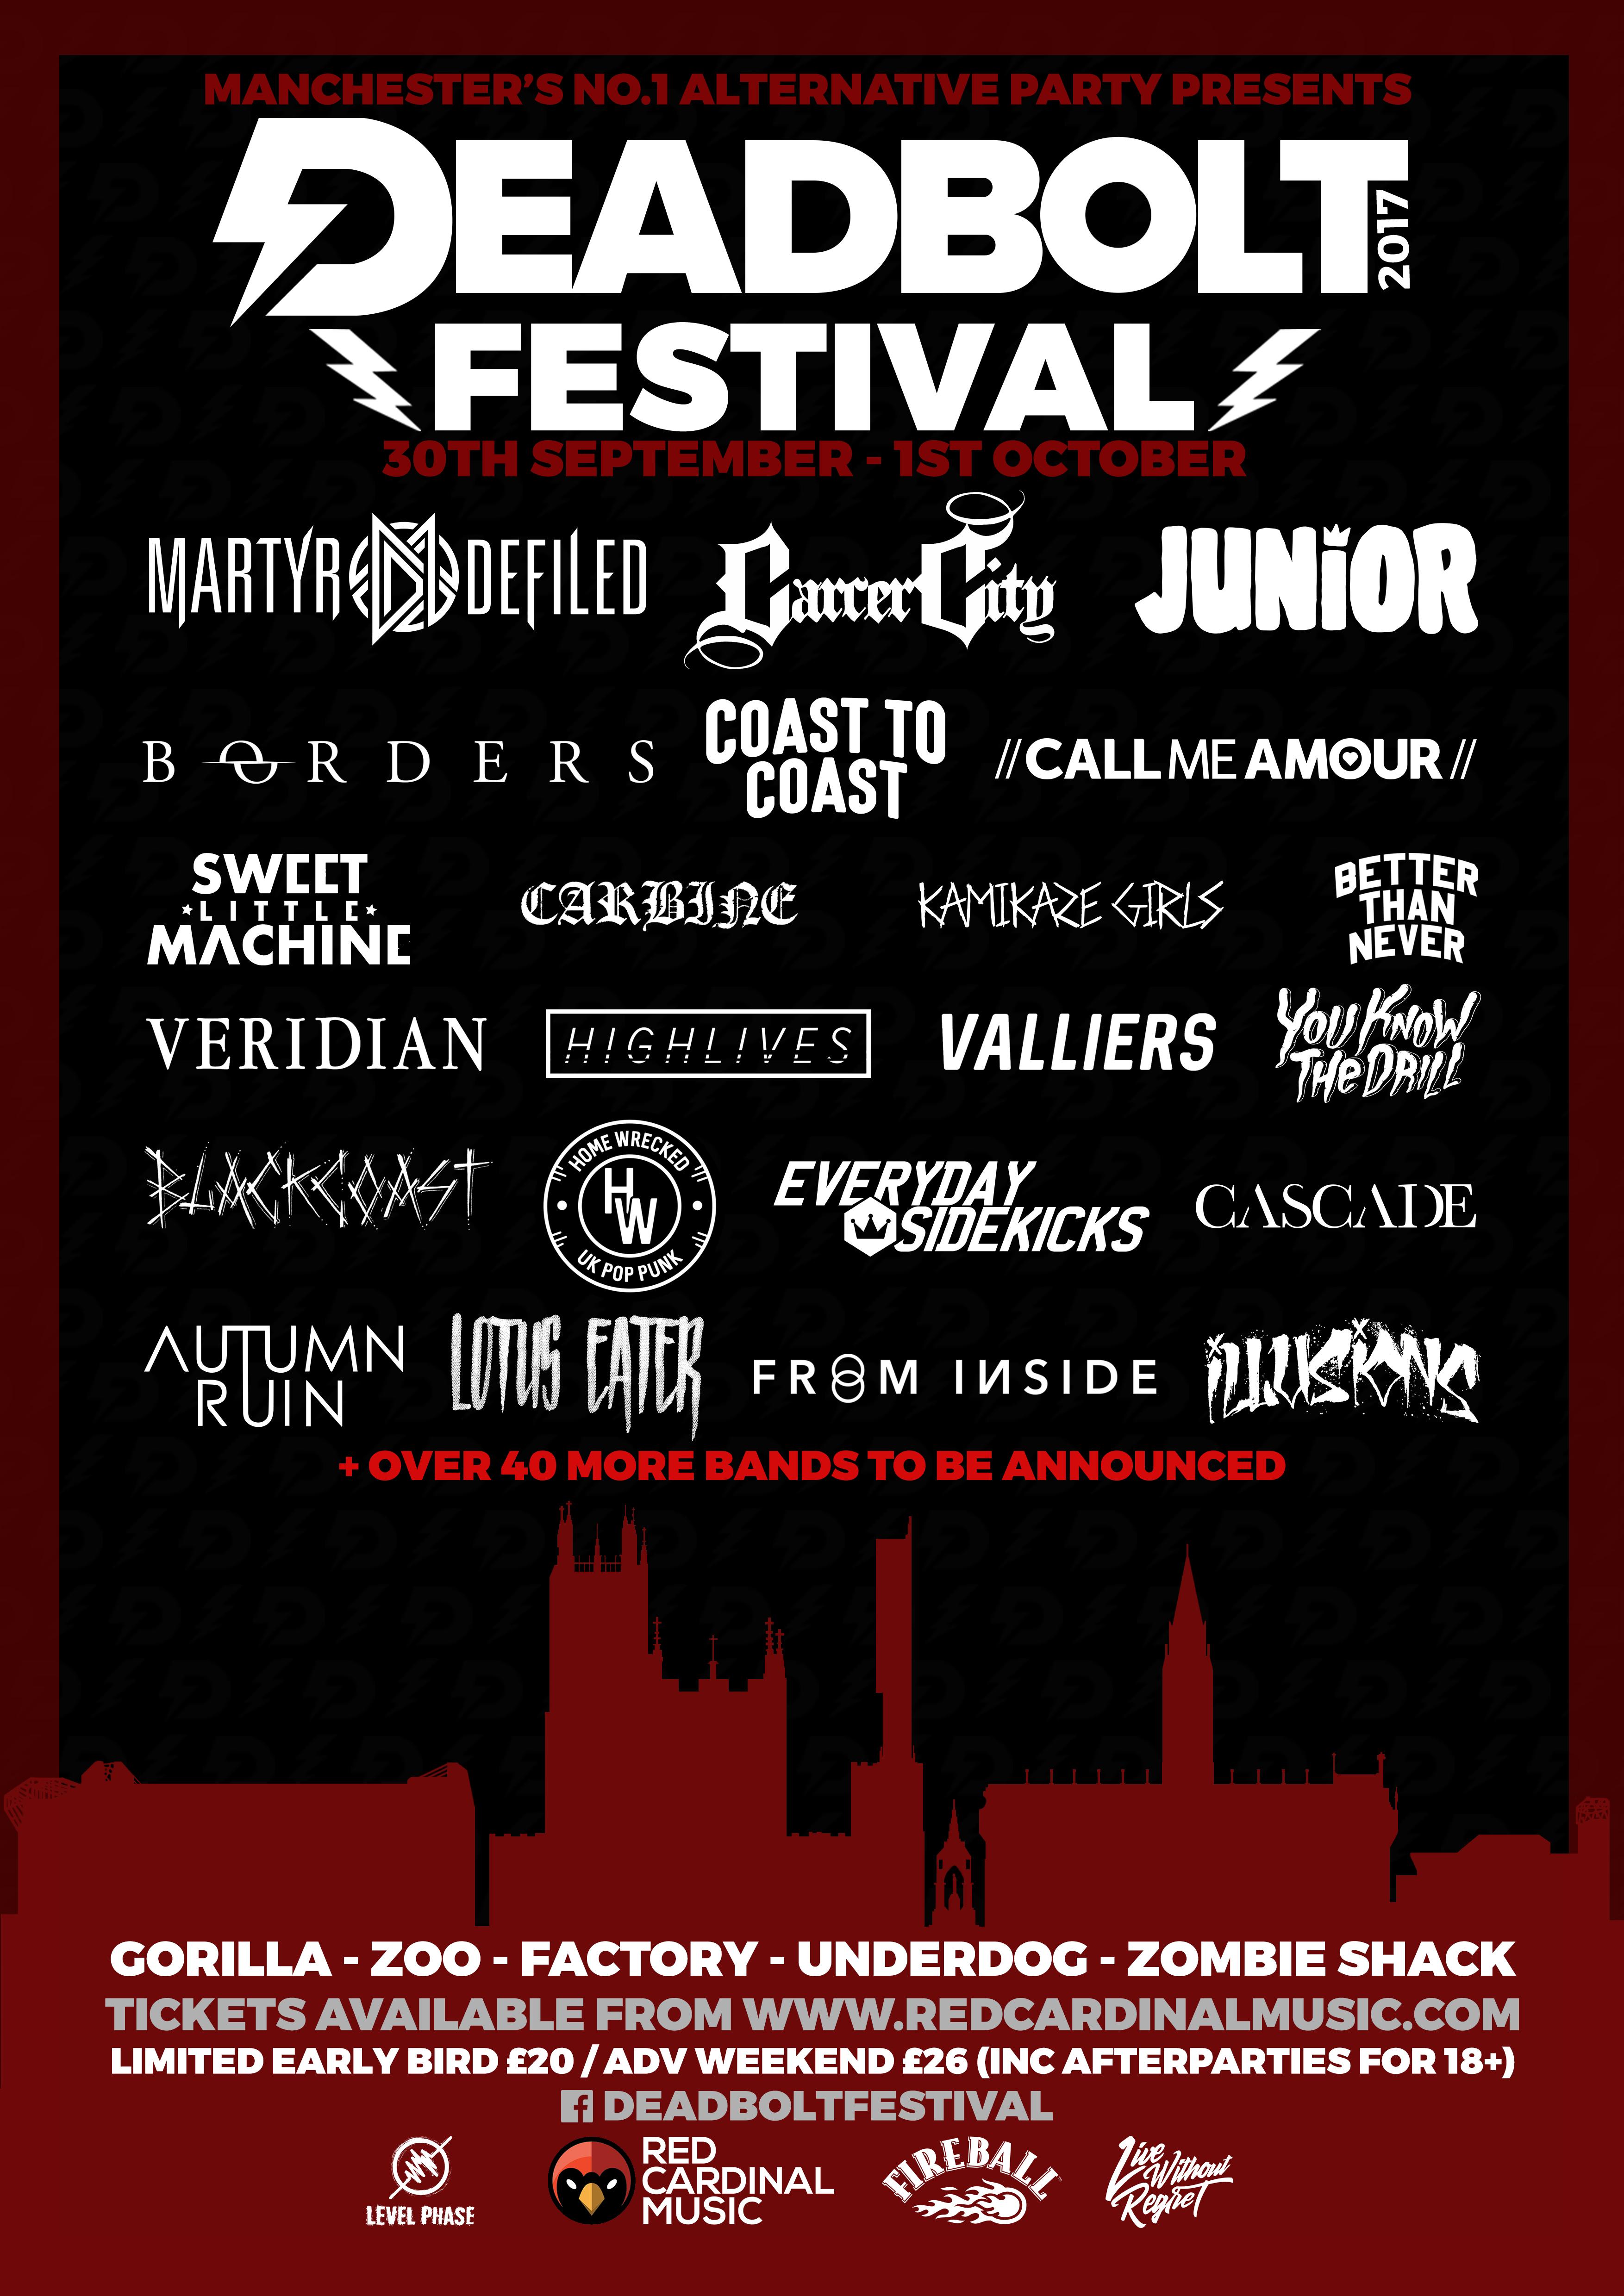 Deadbolt Festival 2017 Announcement 1 - RGB for web use - Red Cardinal Music